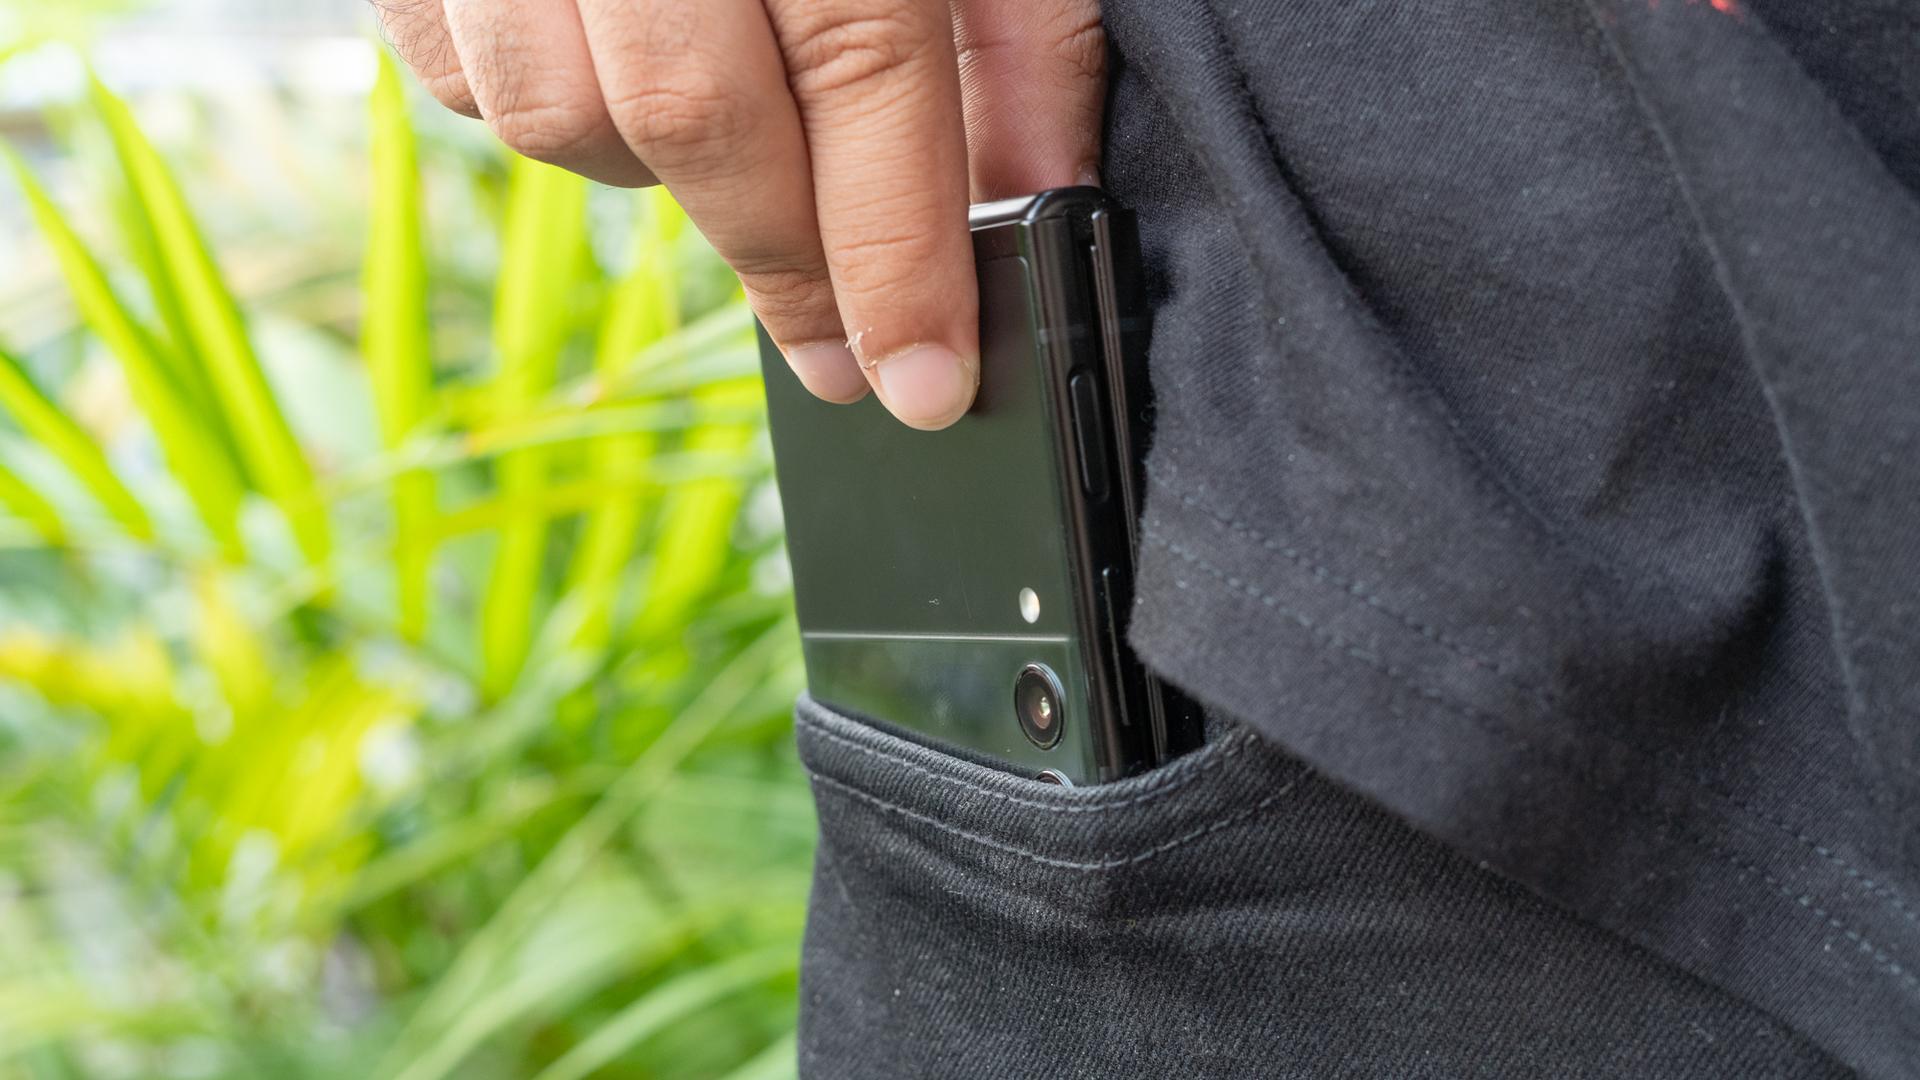 Samsung Galaxy Z Flip 3 slliding phone into pocket